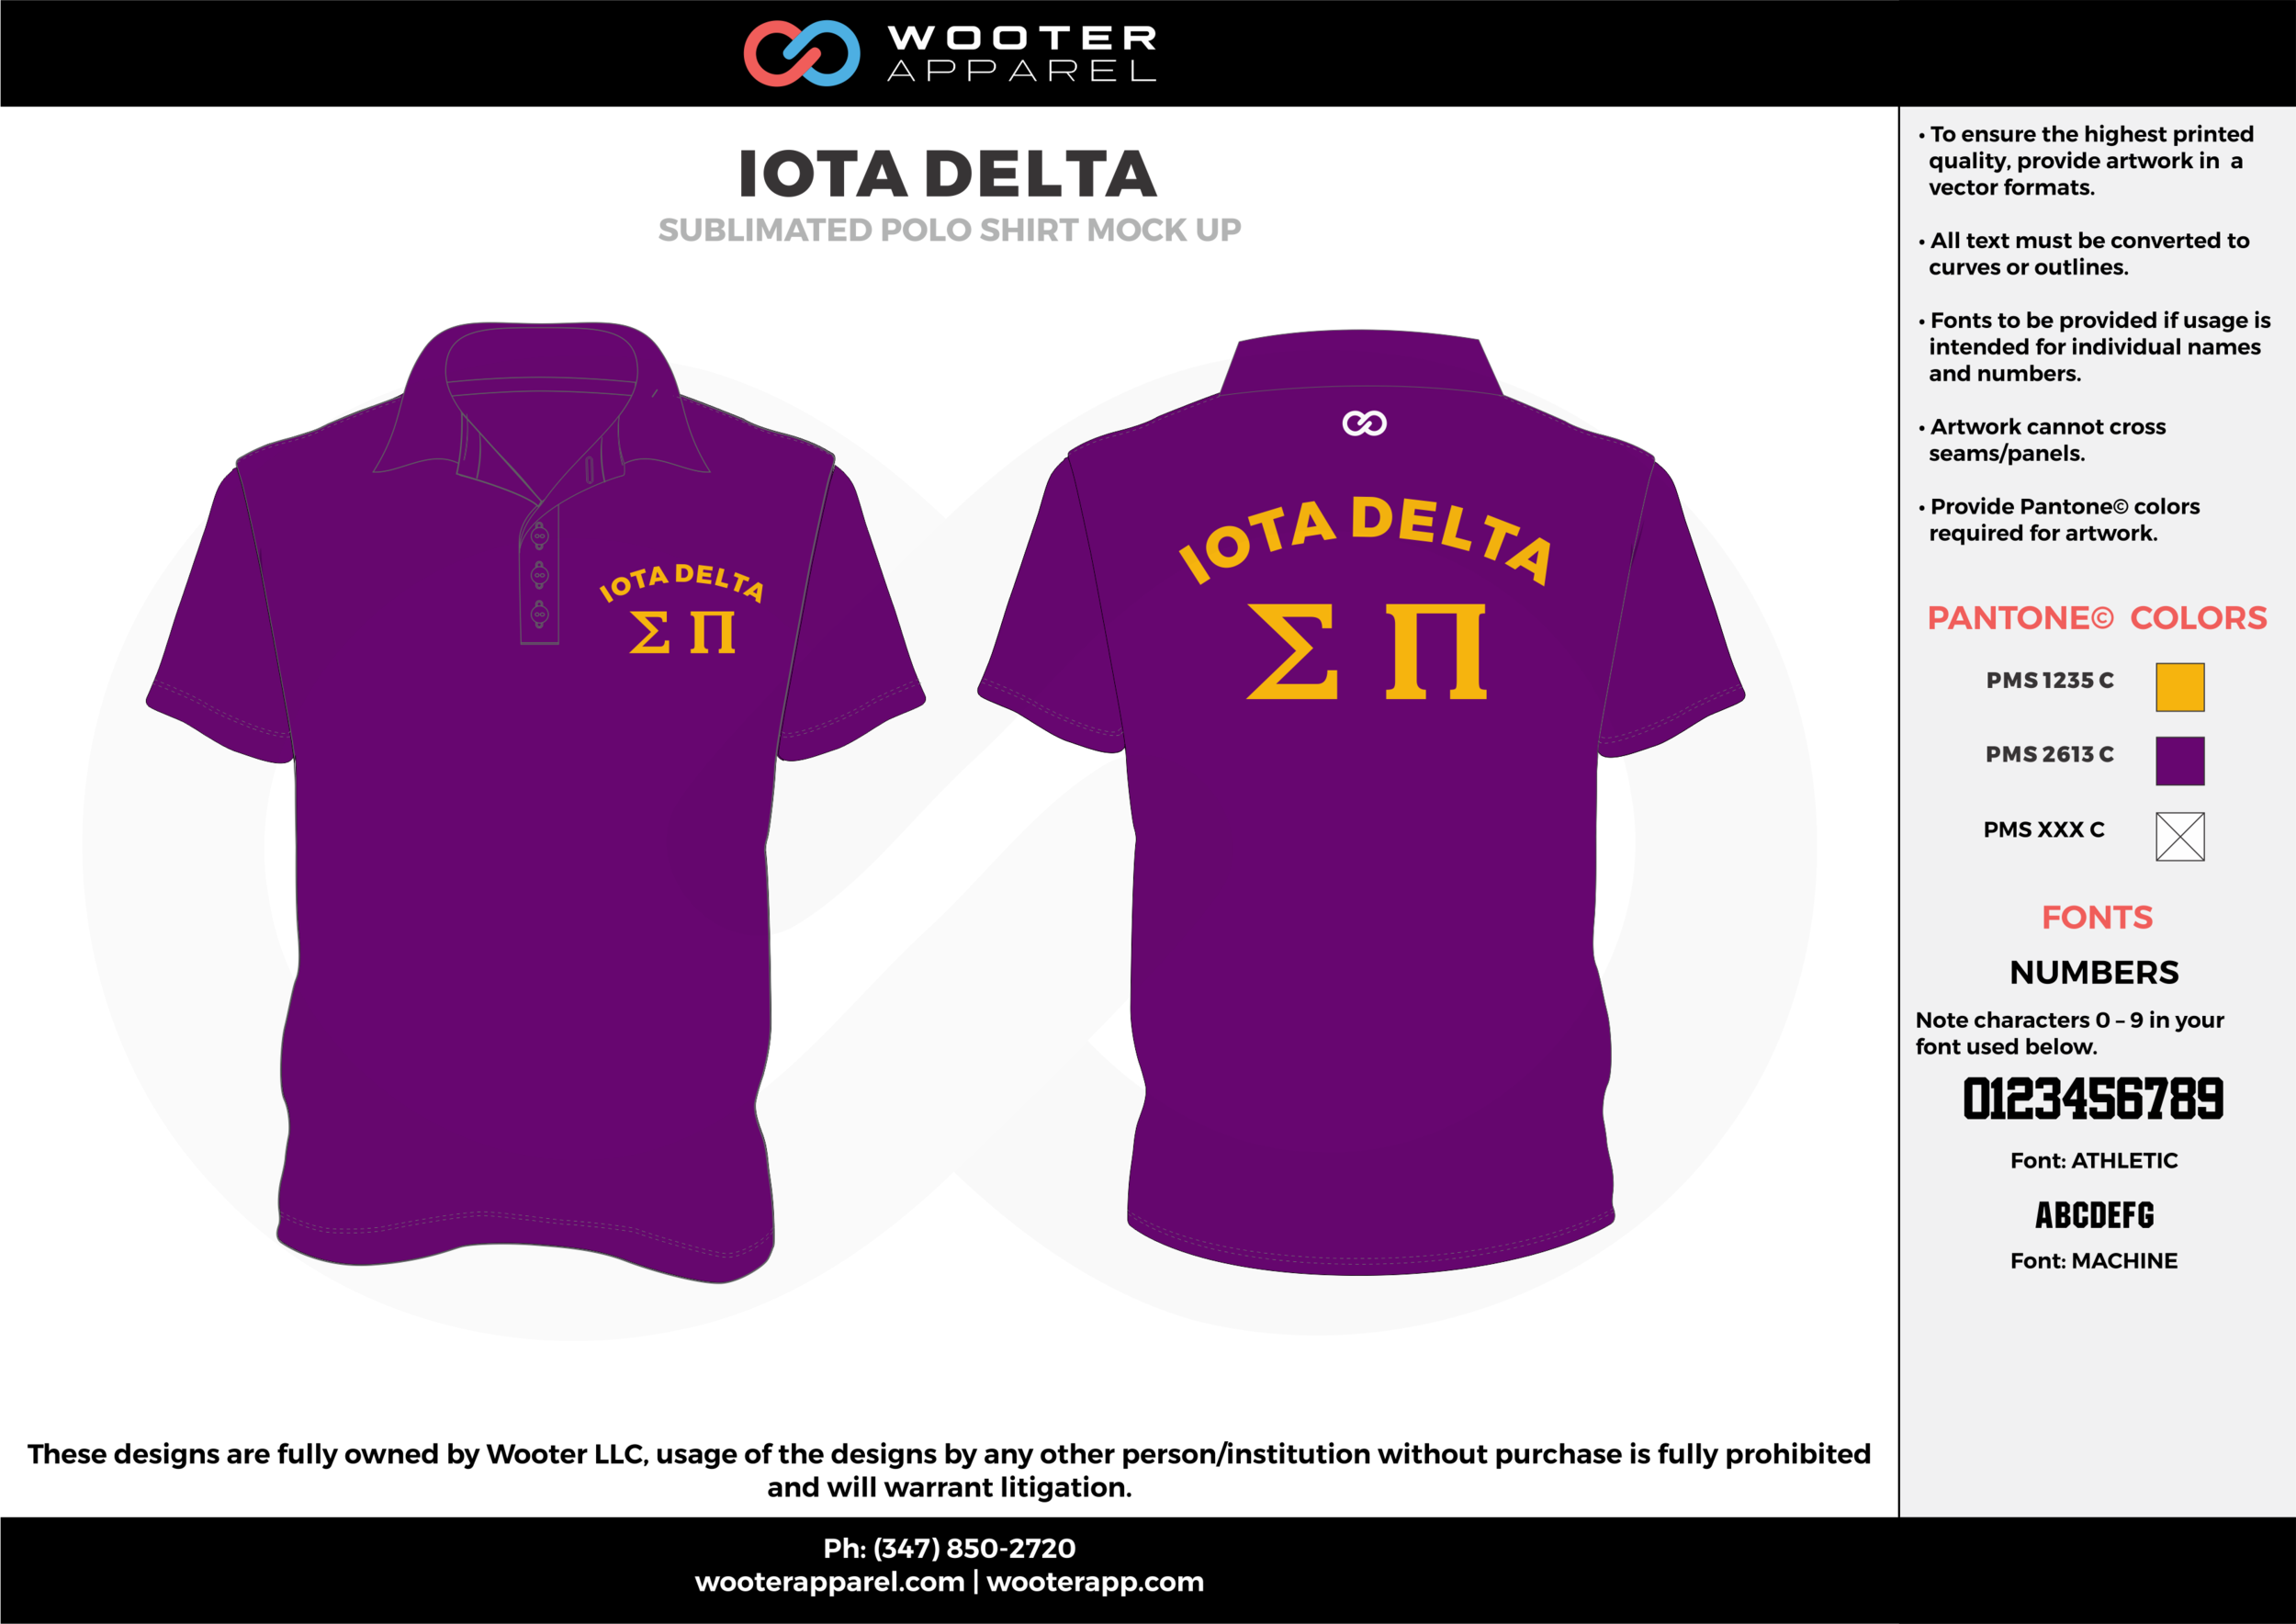 IOTA DELTA purple yellow Polo Shirts